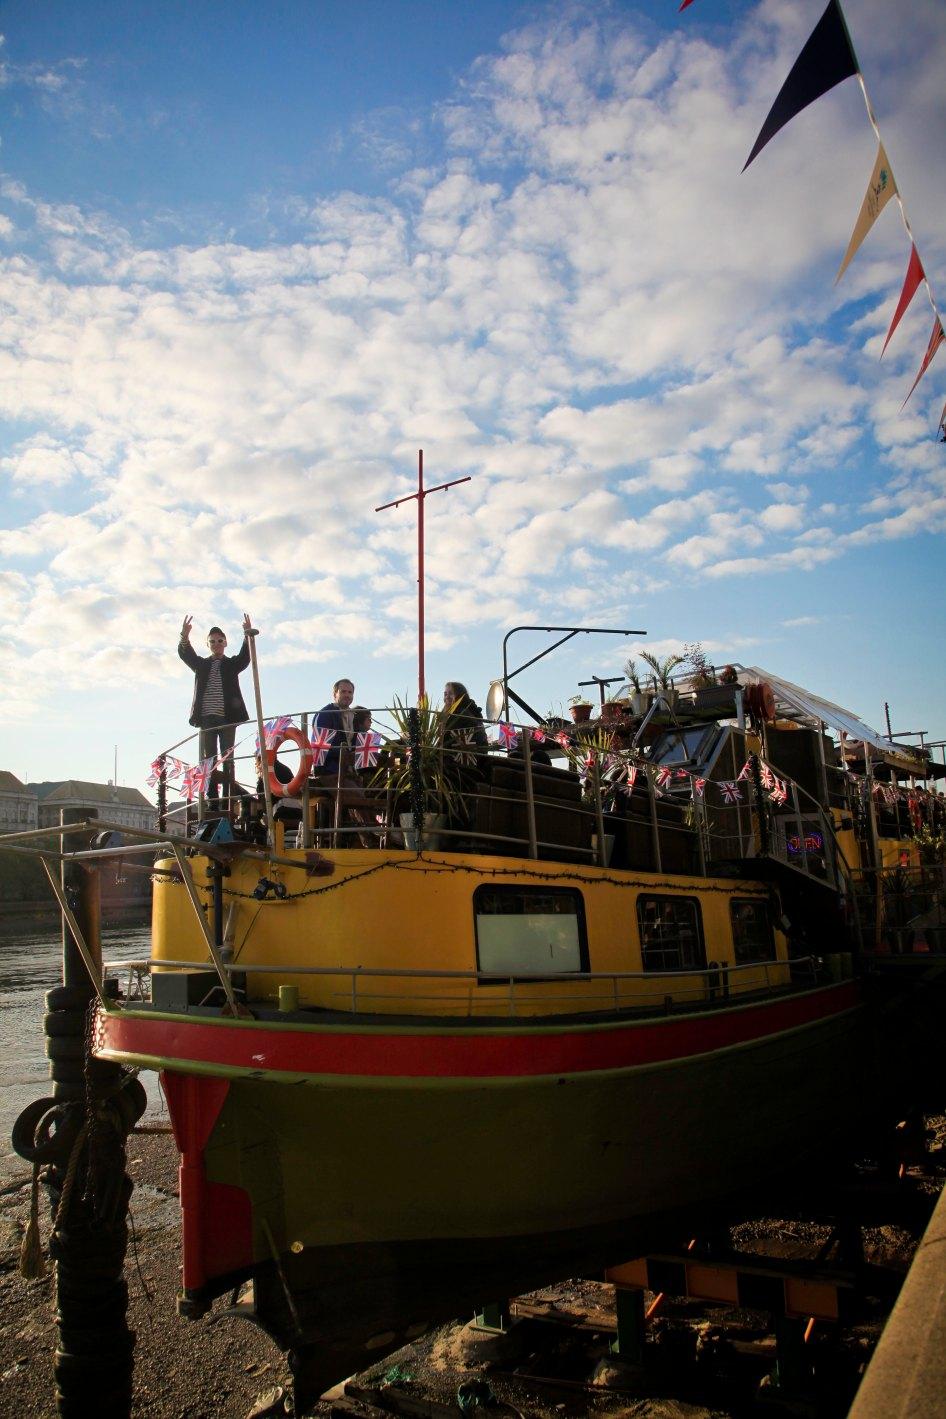 Party Boat, Dan gives vickers.